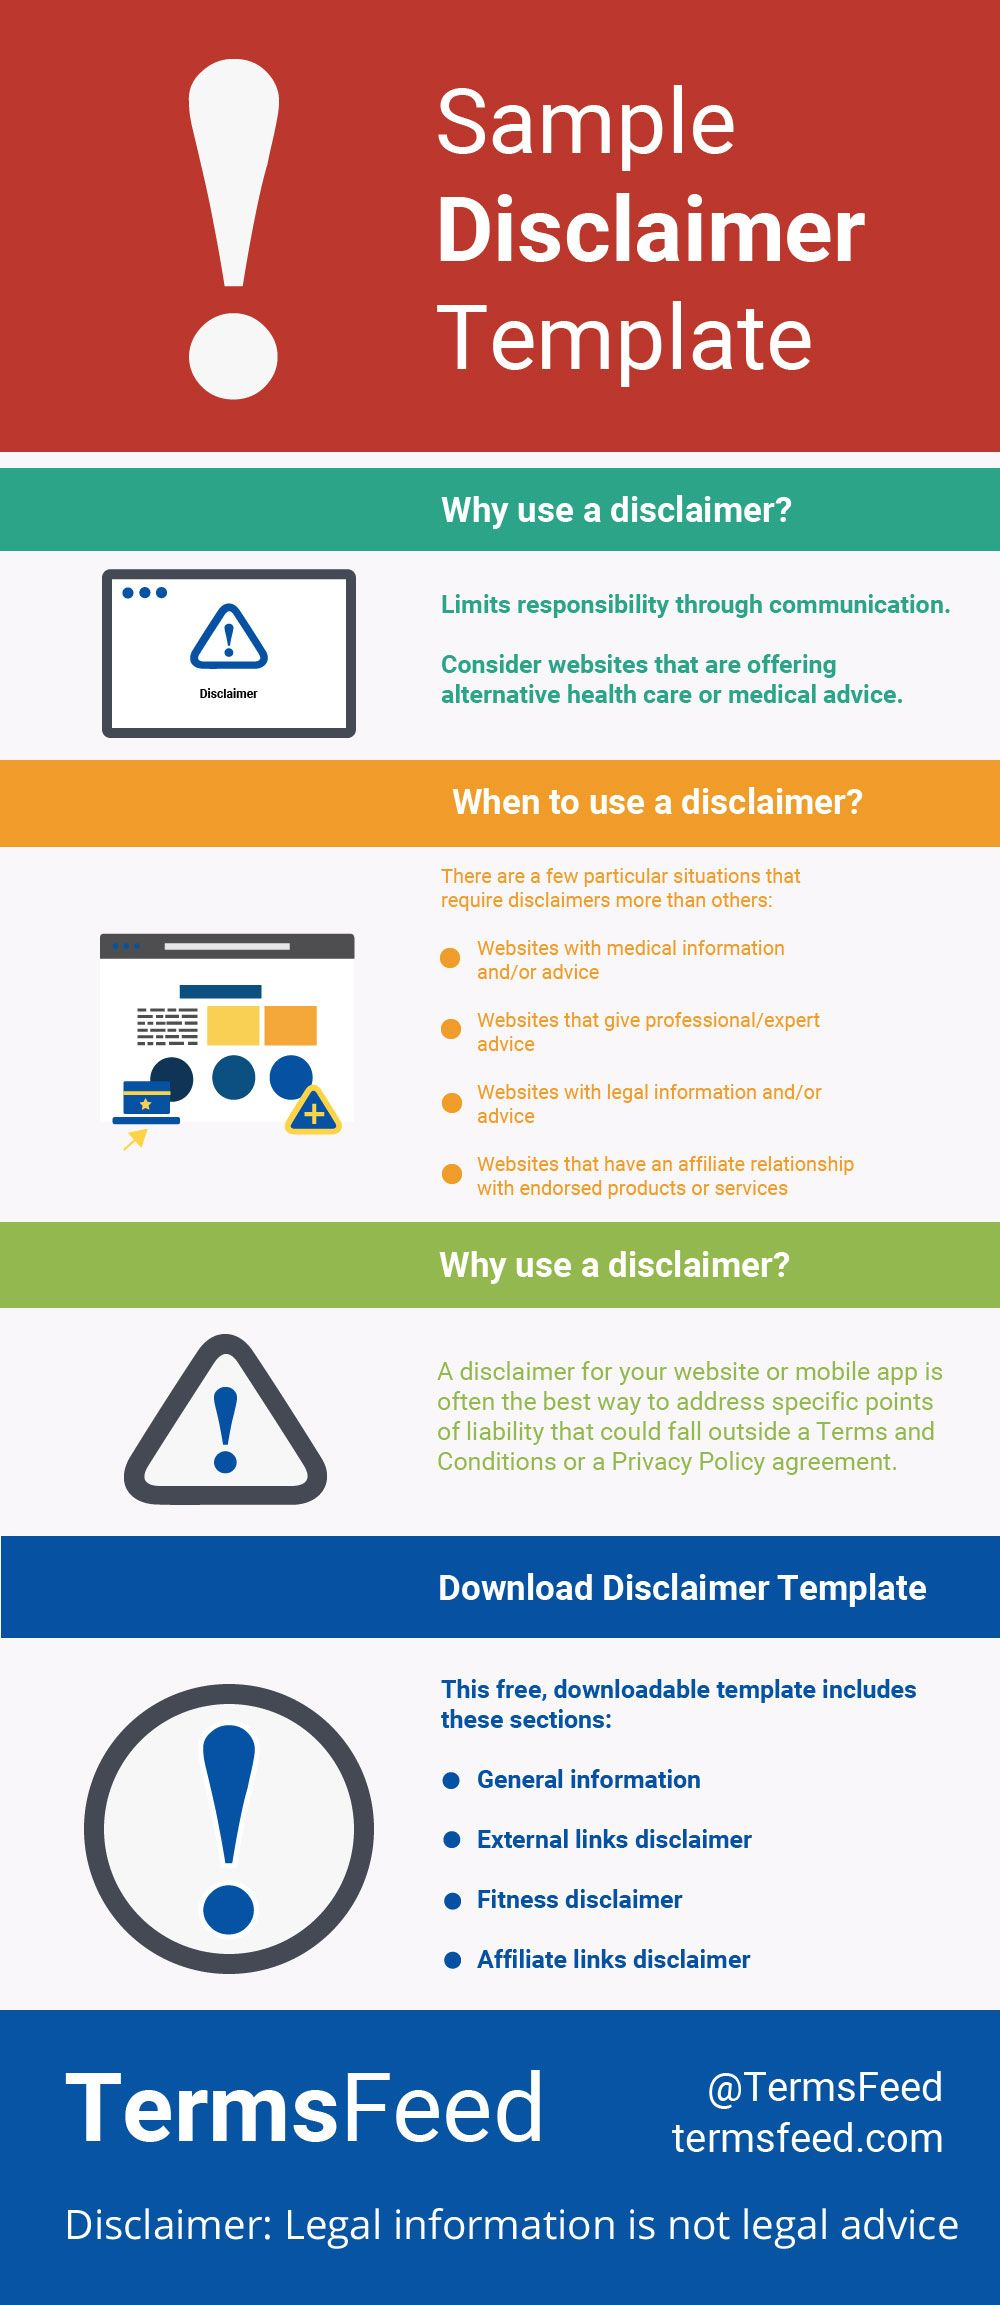 Sample Disclaimer Template Templates Alternative Health Care